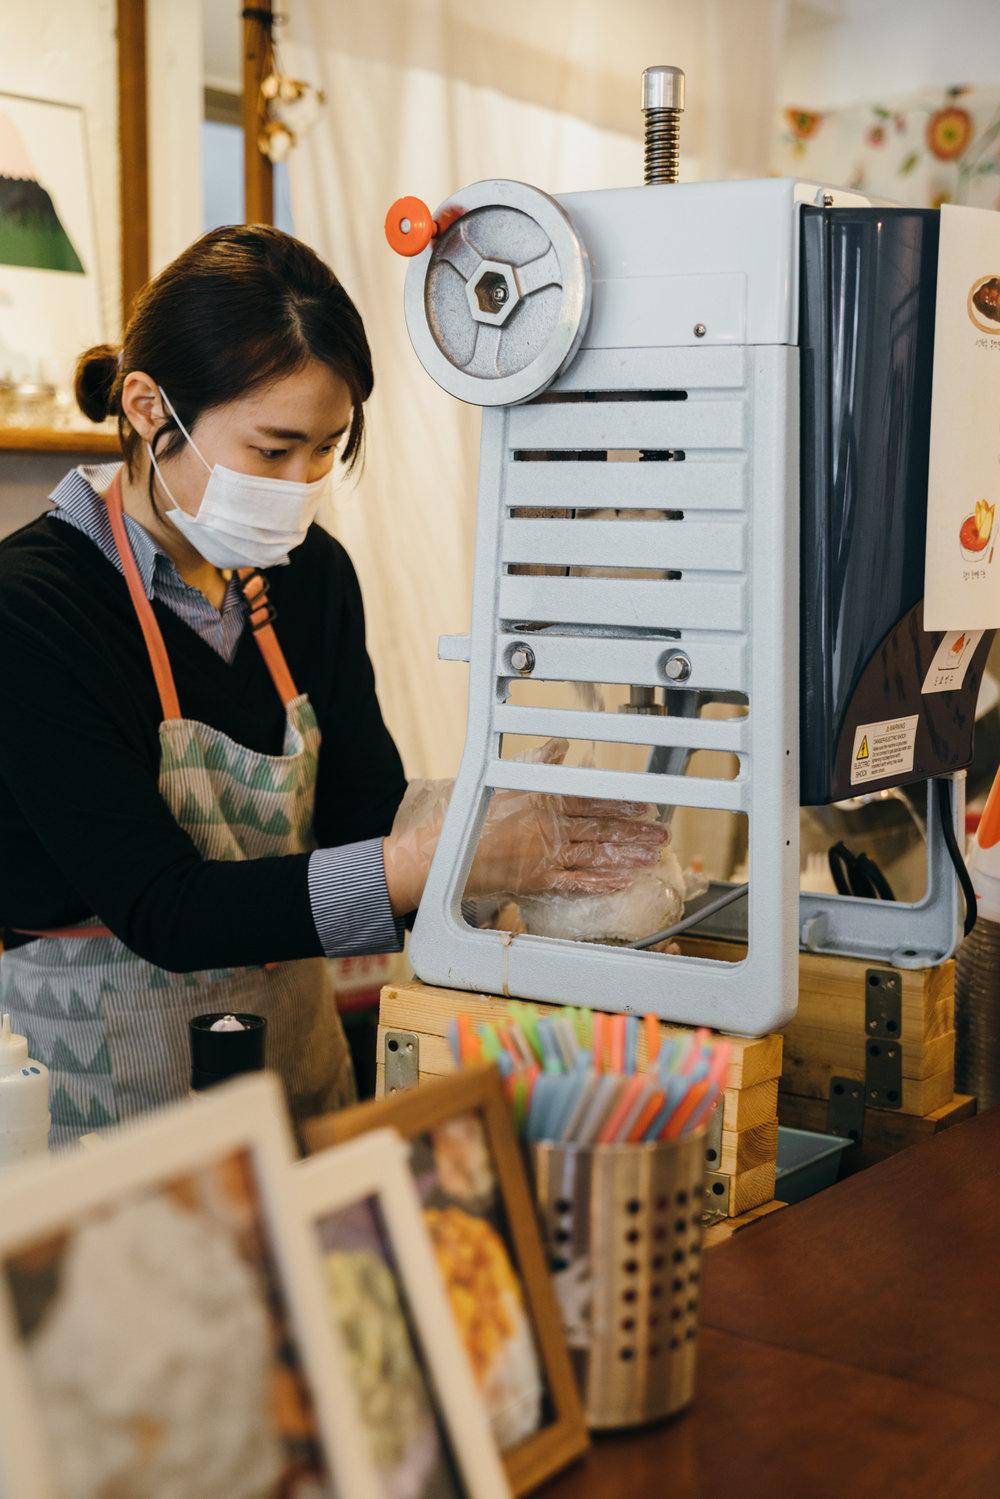 Greysuitcase Seoul Cafe Series: Tokyo Bingsu (도쿄빙수) , Mangwon-dong (망원동), Seoul, South Korea.